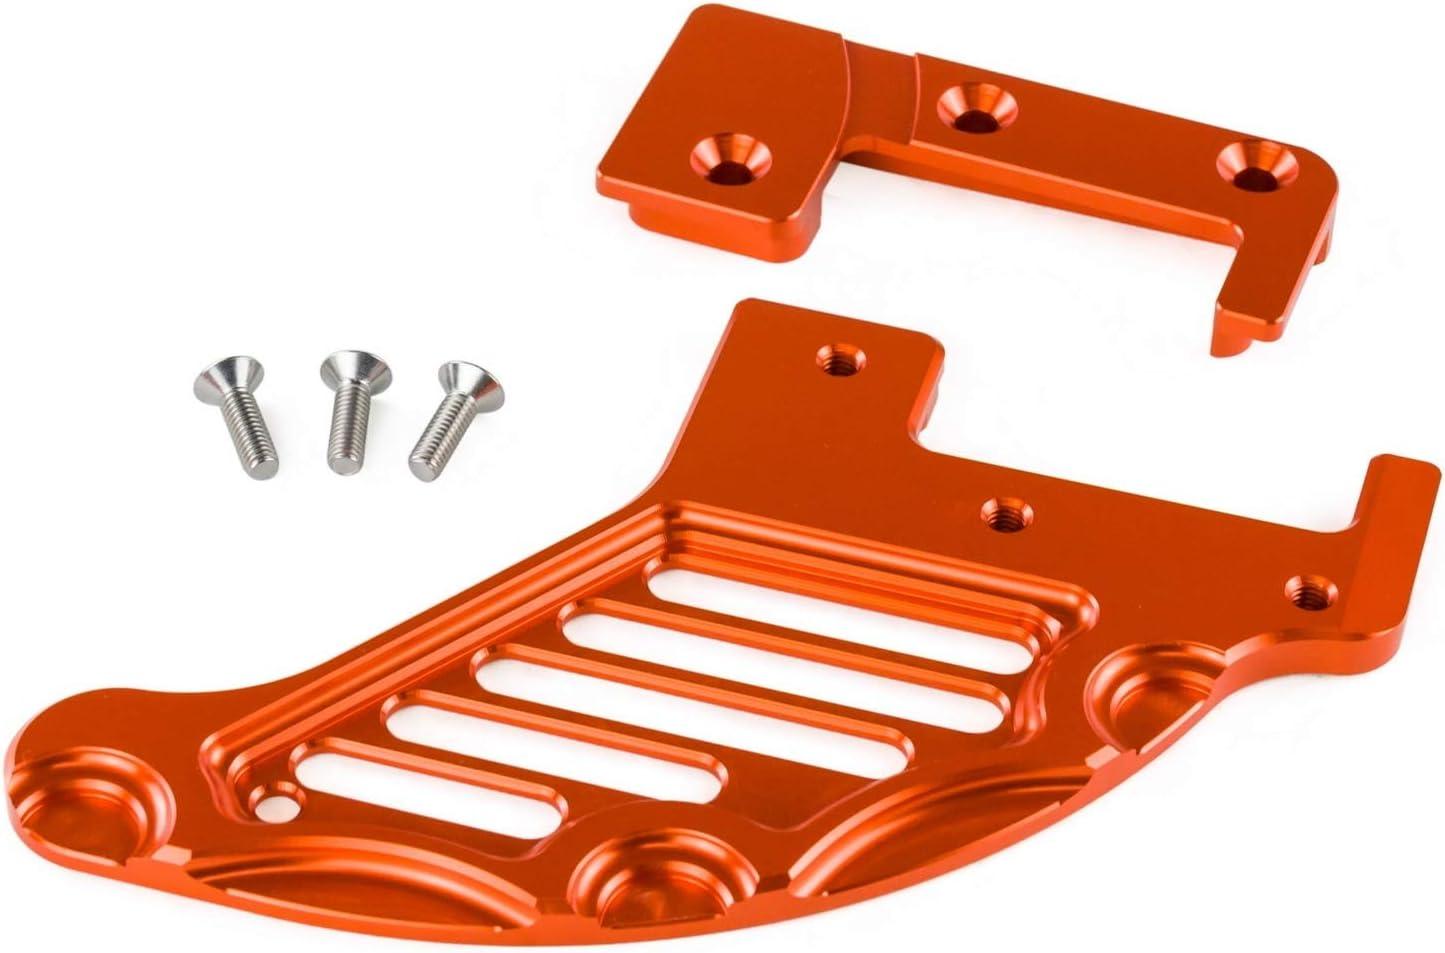 Color : Sky Blue Anhui-dsb Bremsscheibe hinten Schutz for KTM SX SXF EXC EXCF XC XCF XCW for Husqvarna Husaberg TE FE TC FC TX FX 125 150 250 350 450 501 530